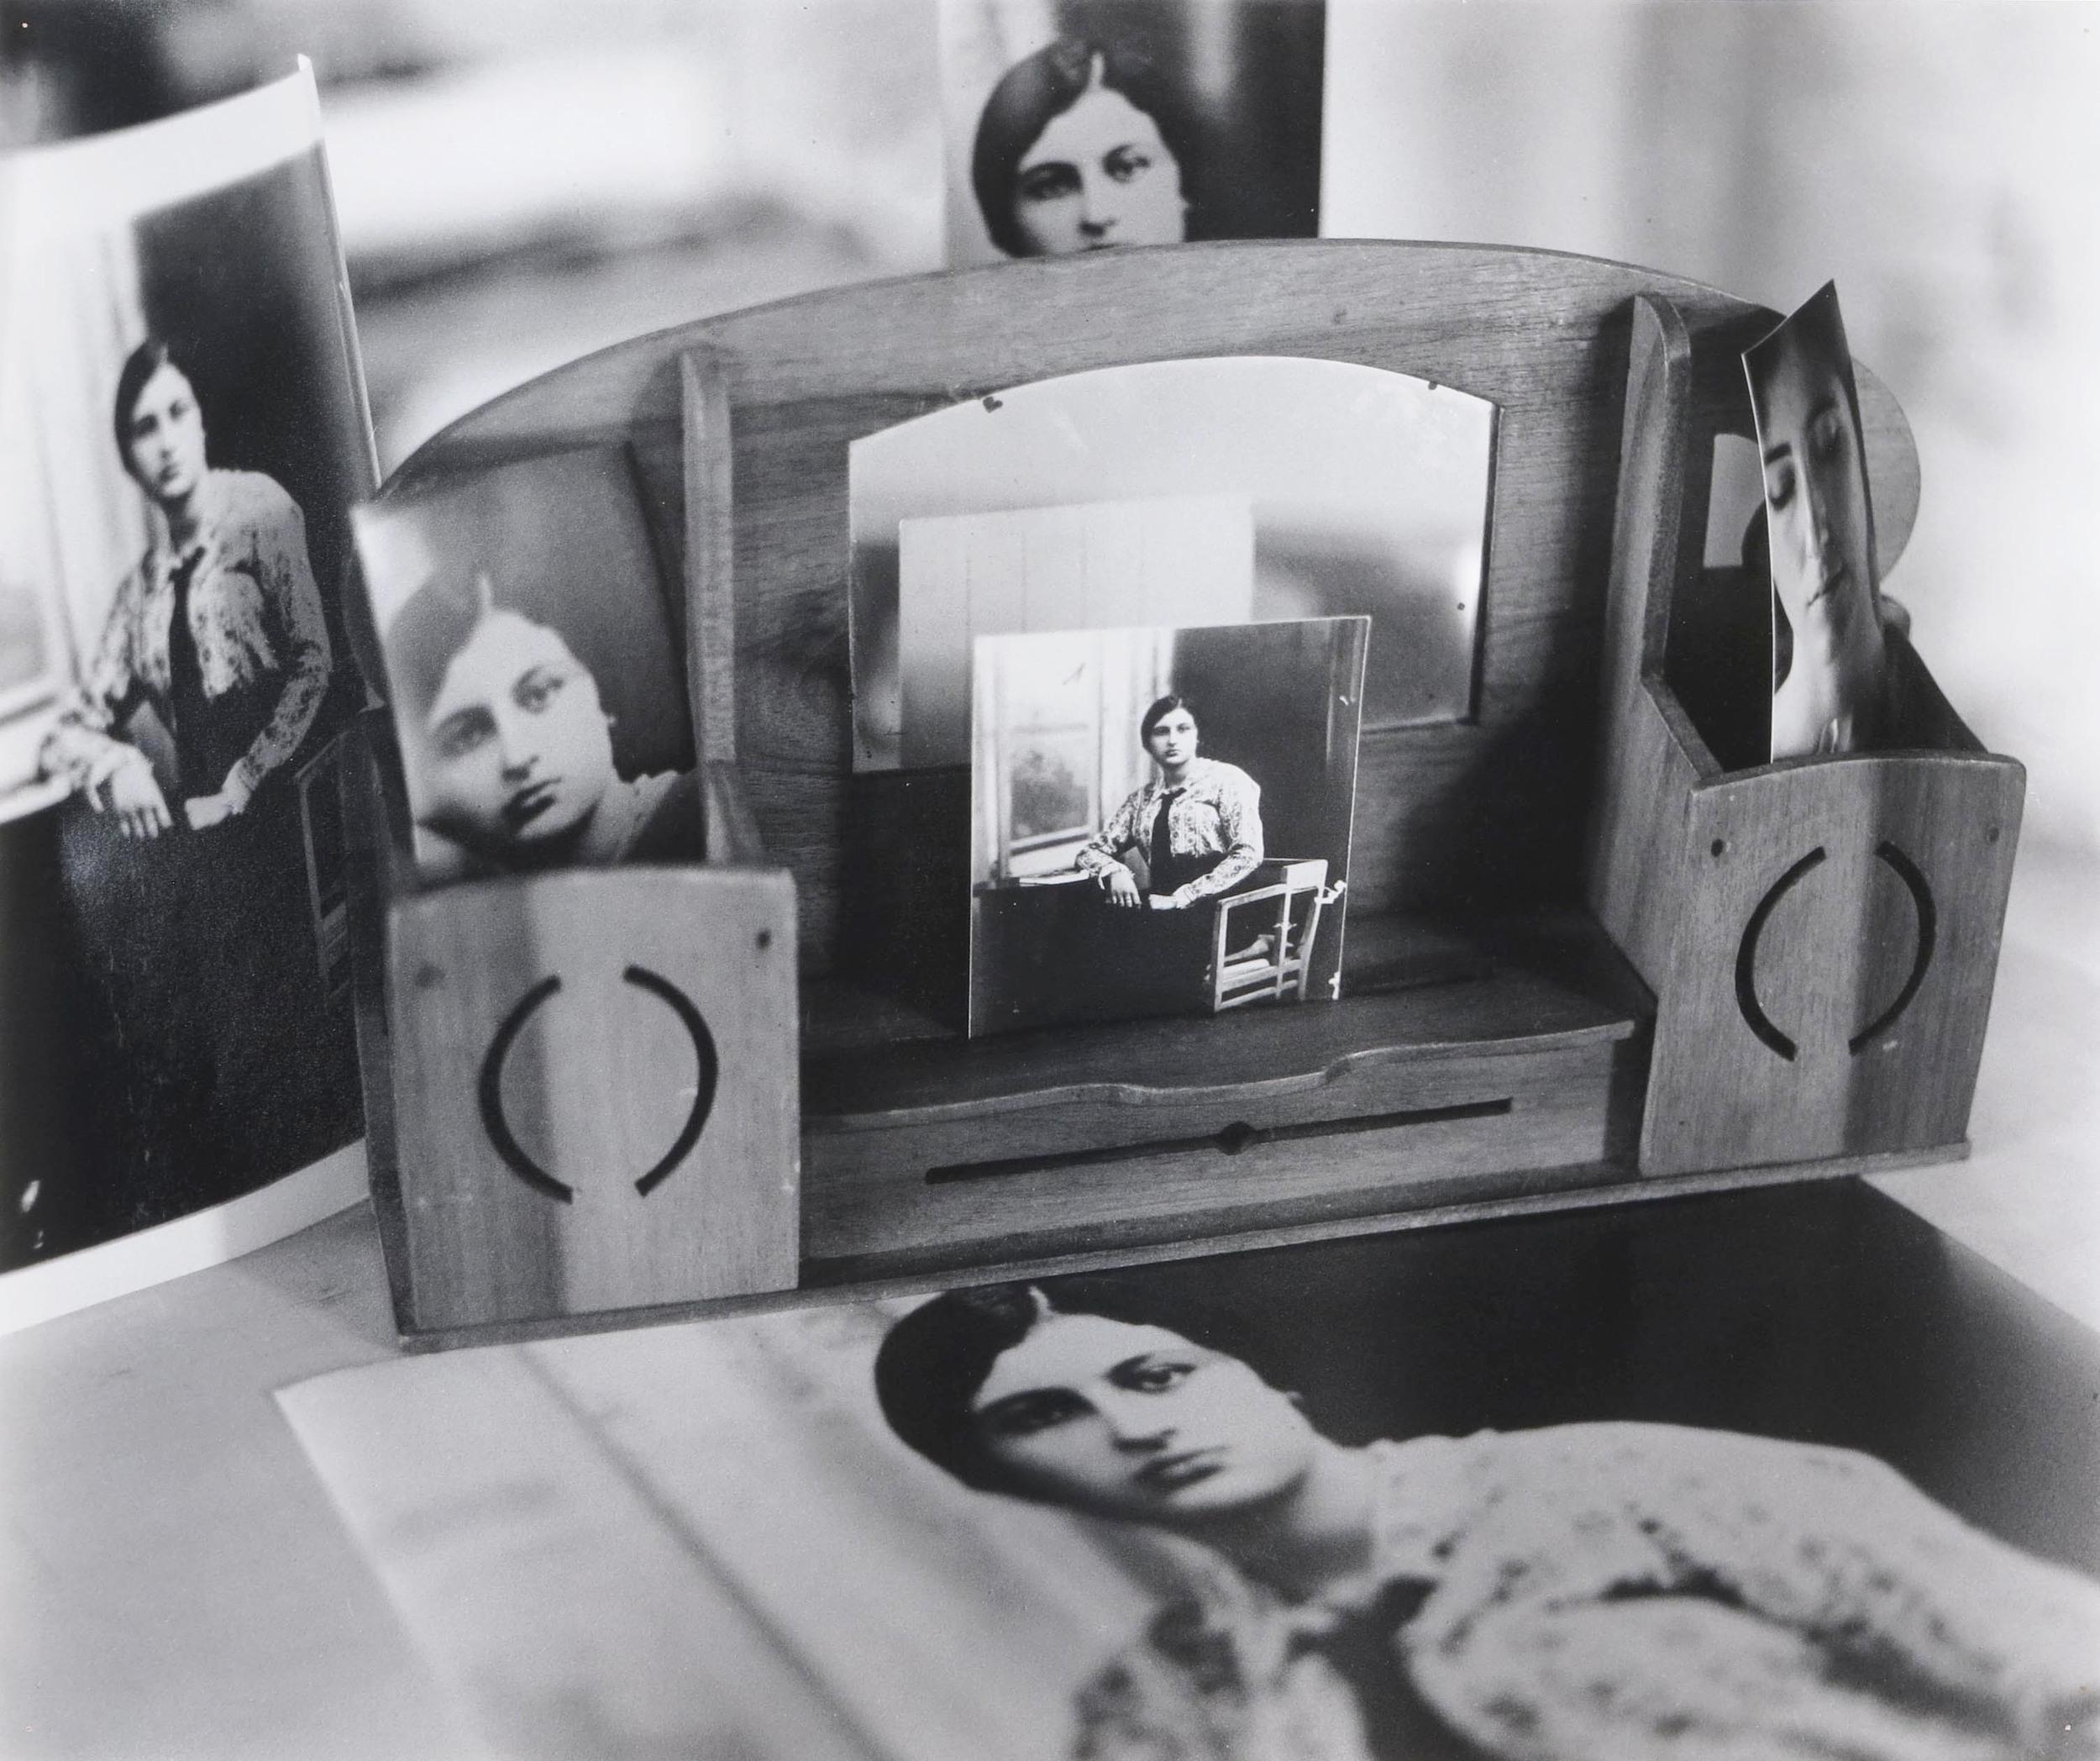 Shrine for a Saint, 1920  2014  gelatin silver print  20 x 24 inches